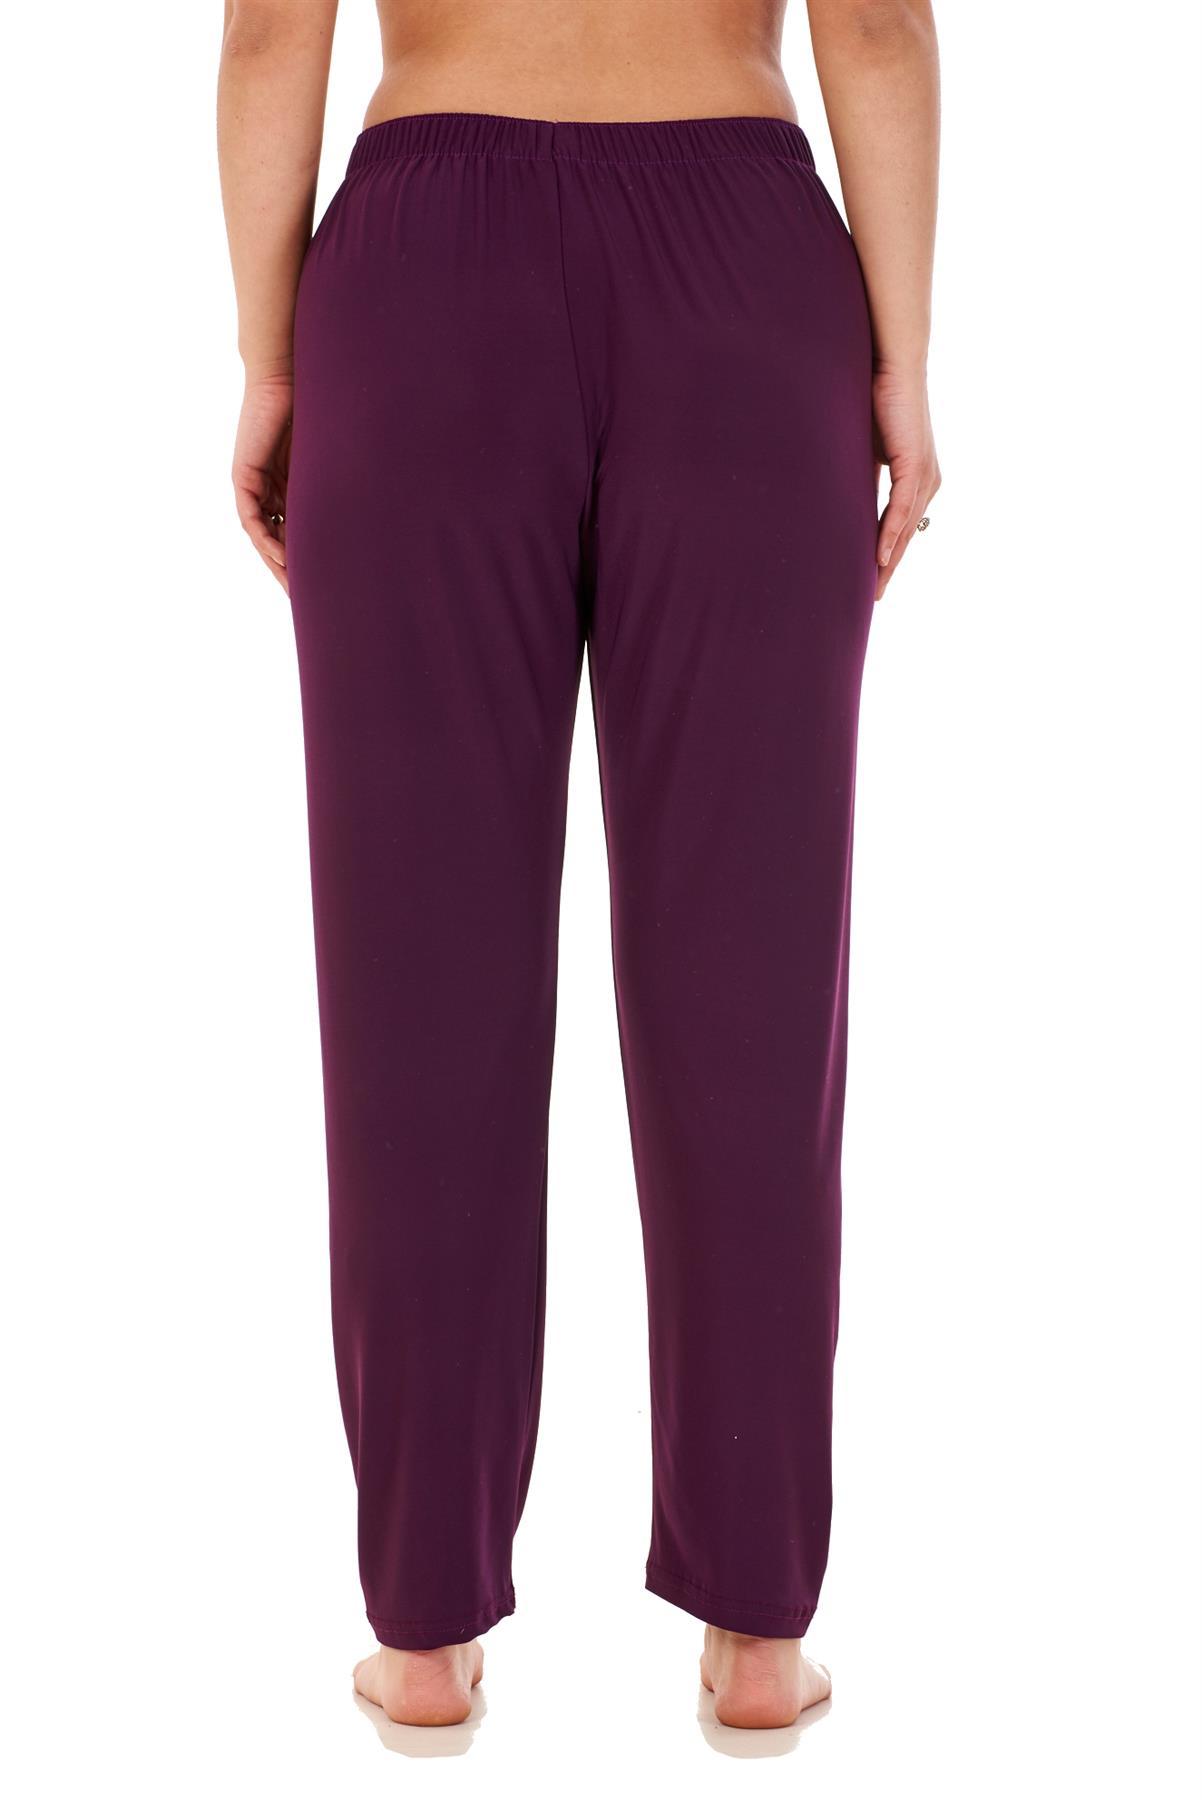 Ladies-Women-Trouser-Elasticated-Tapered-High-waist-ITY-Regular-Pants-Black thumbnail 32